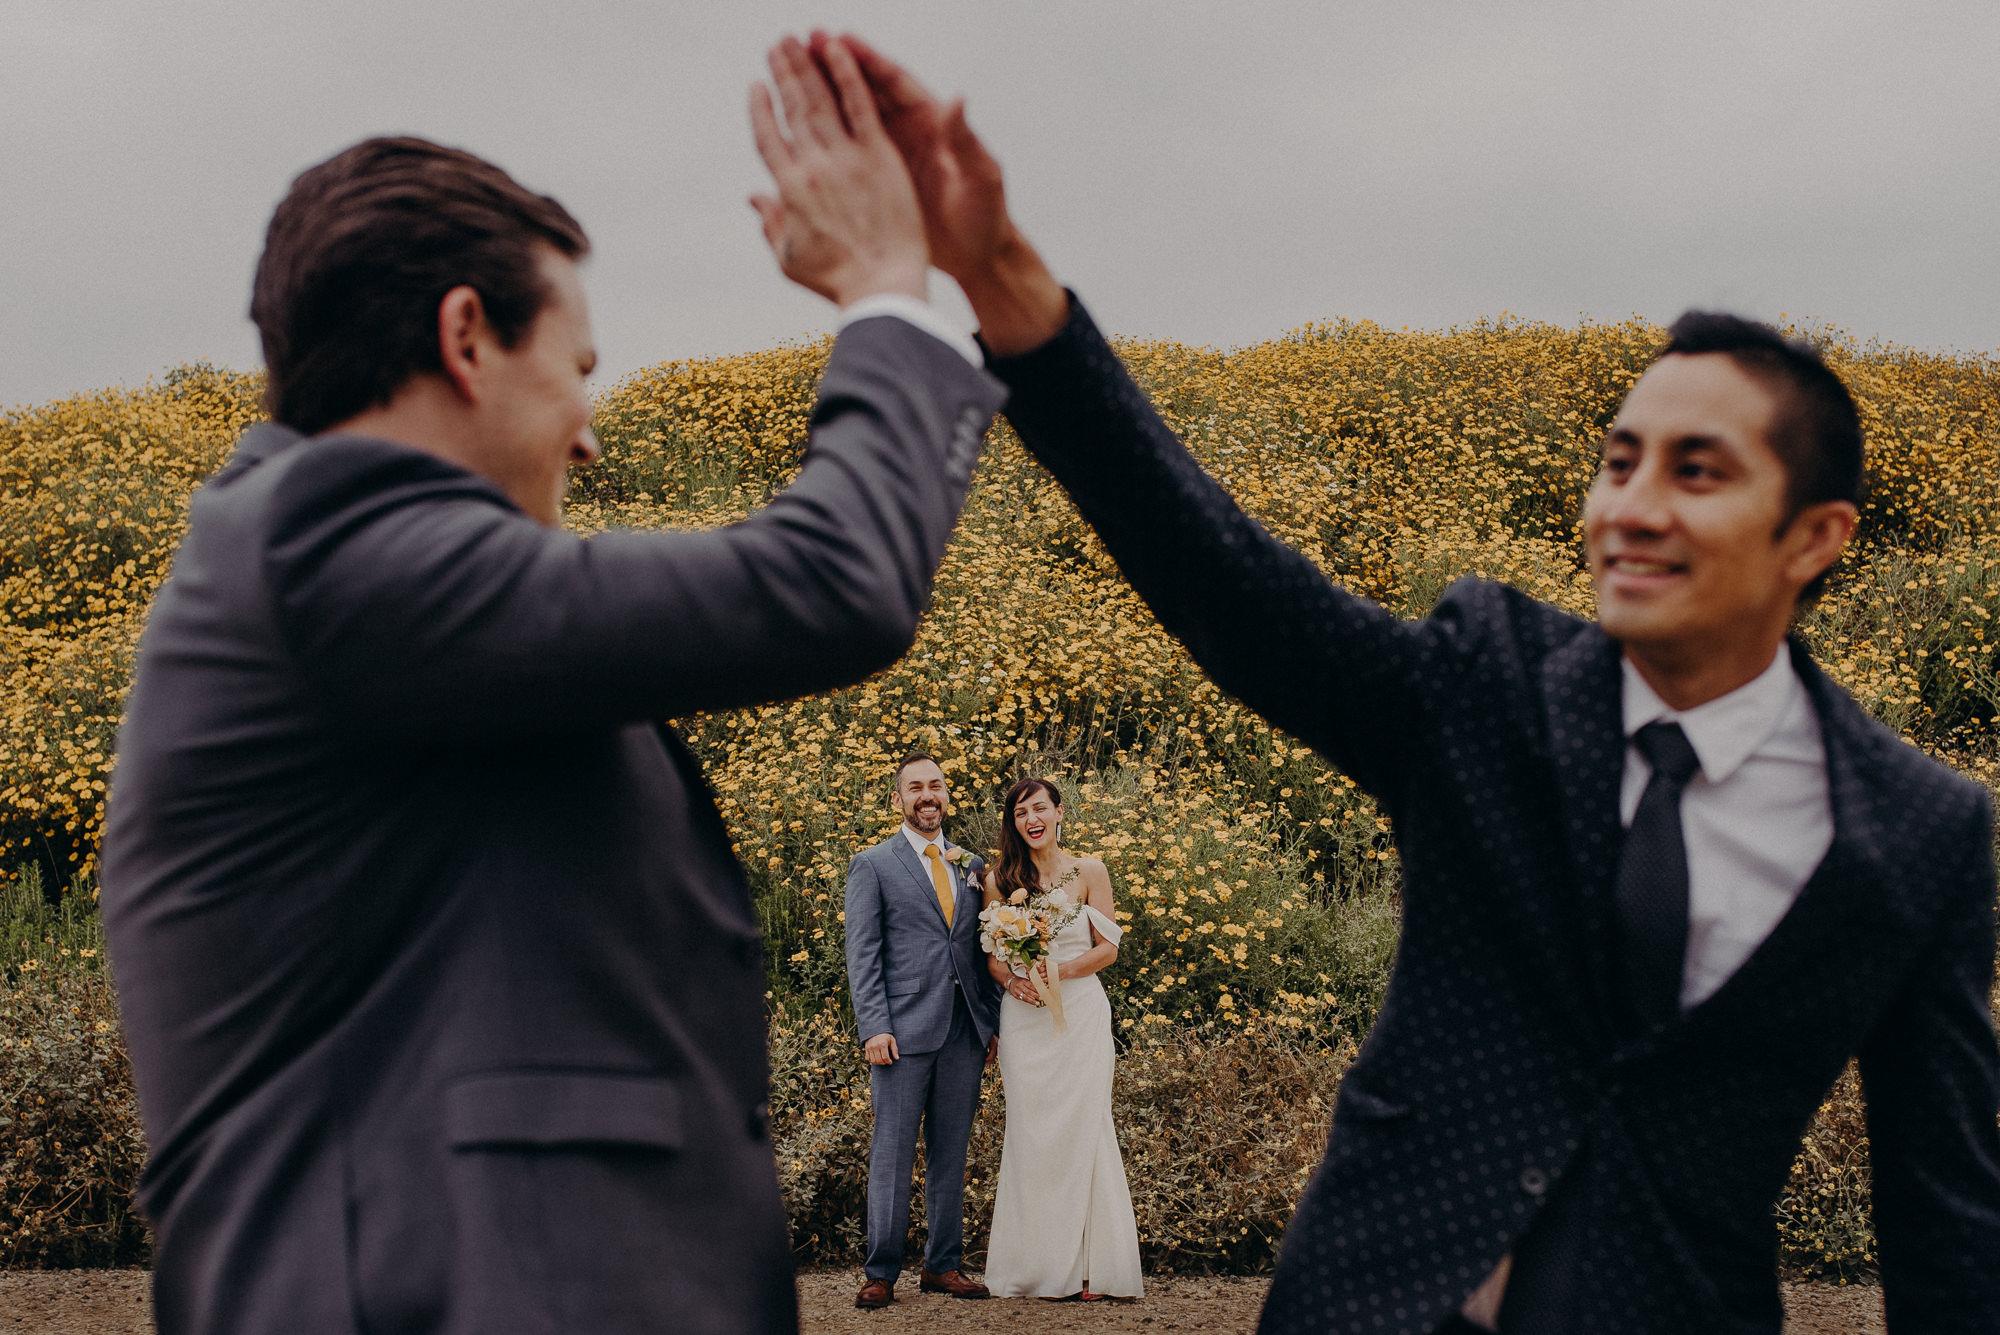 elopement photographer in los angeles - la wedding photographer - isaiahandtaylor.com-018.jpg